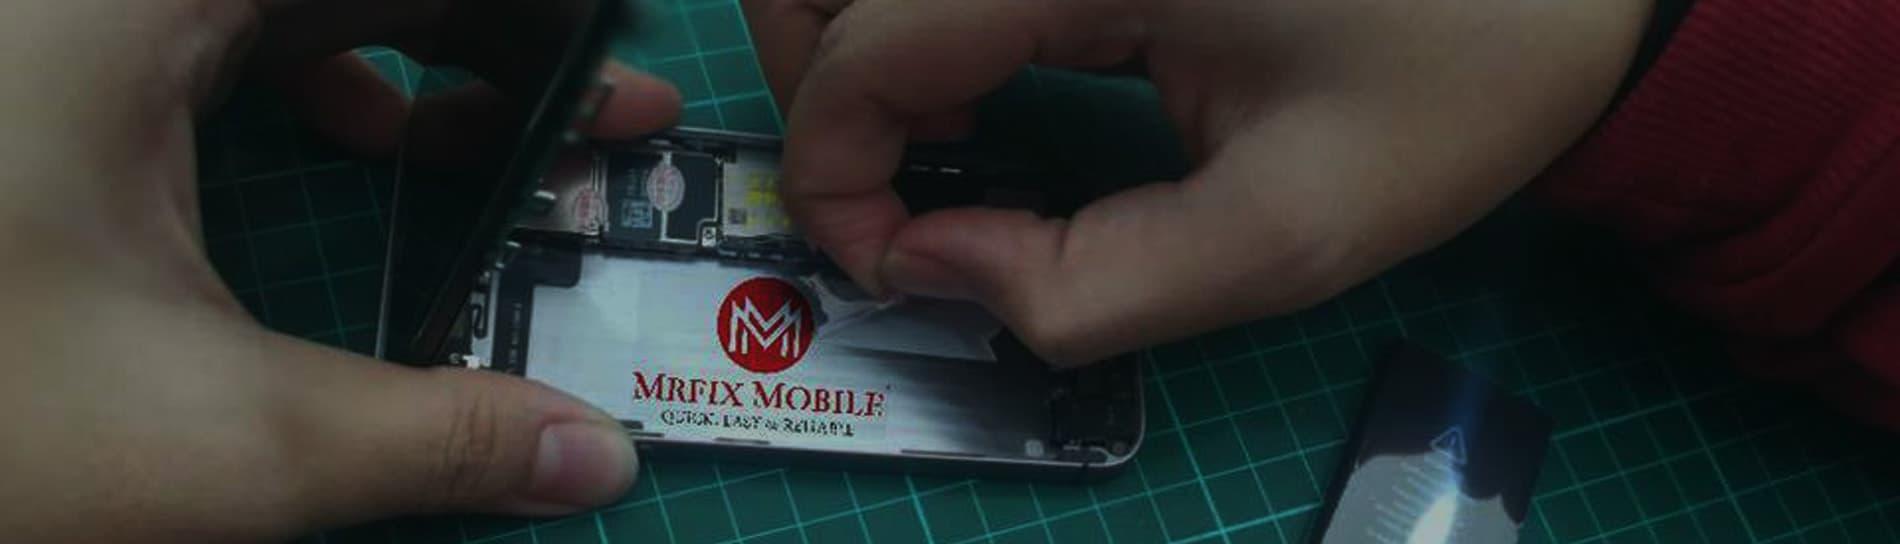 Kedai Repair Handphone Bandar Baru Bangi